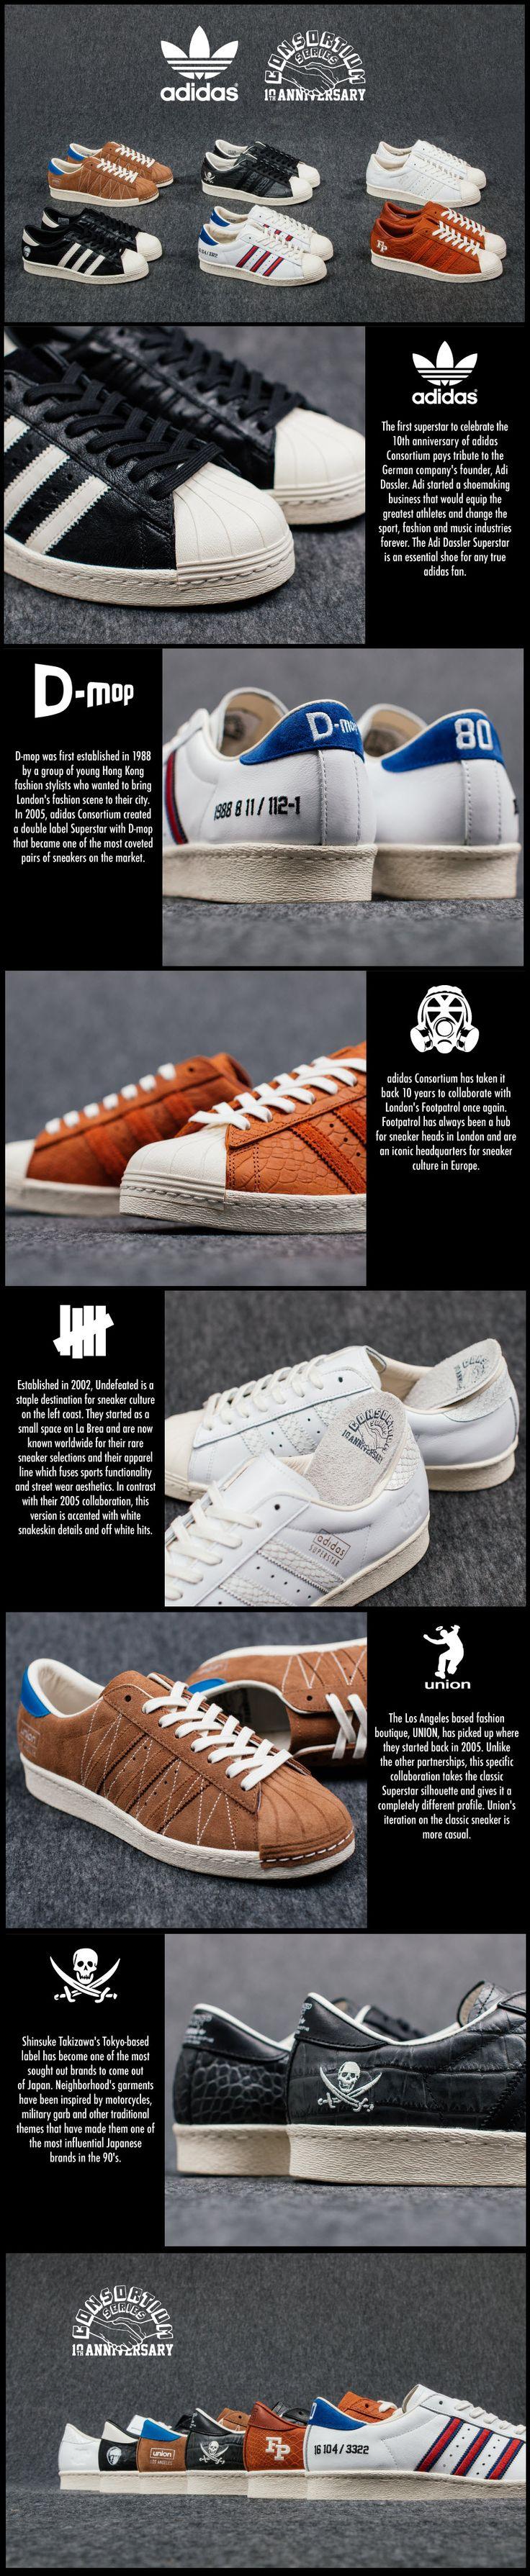 adidas Consortium Superstar 10th Anniversary